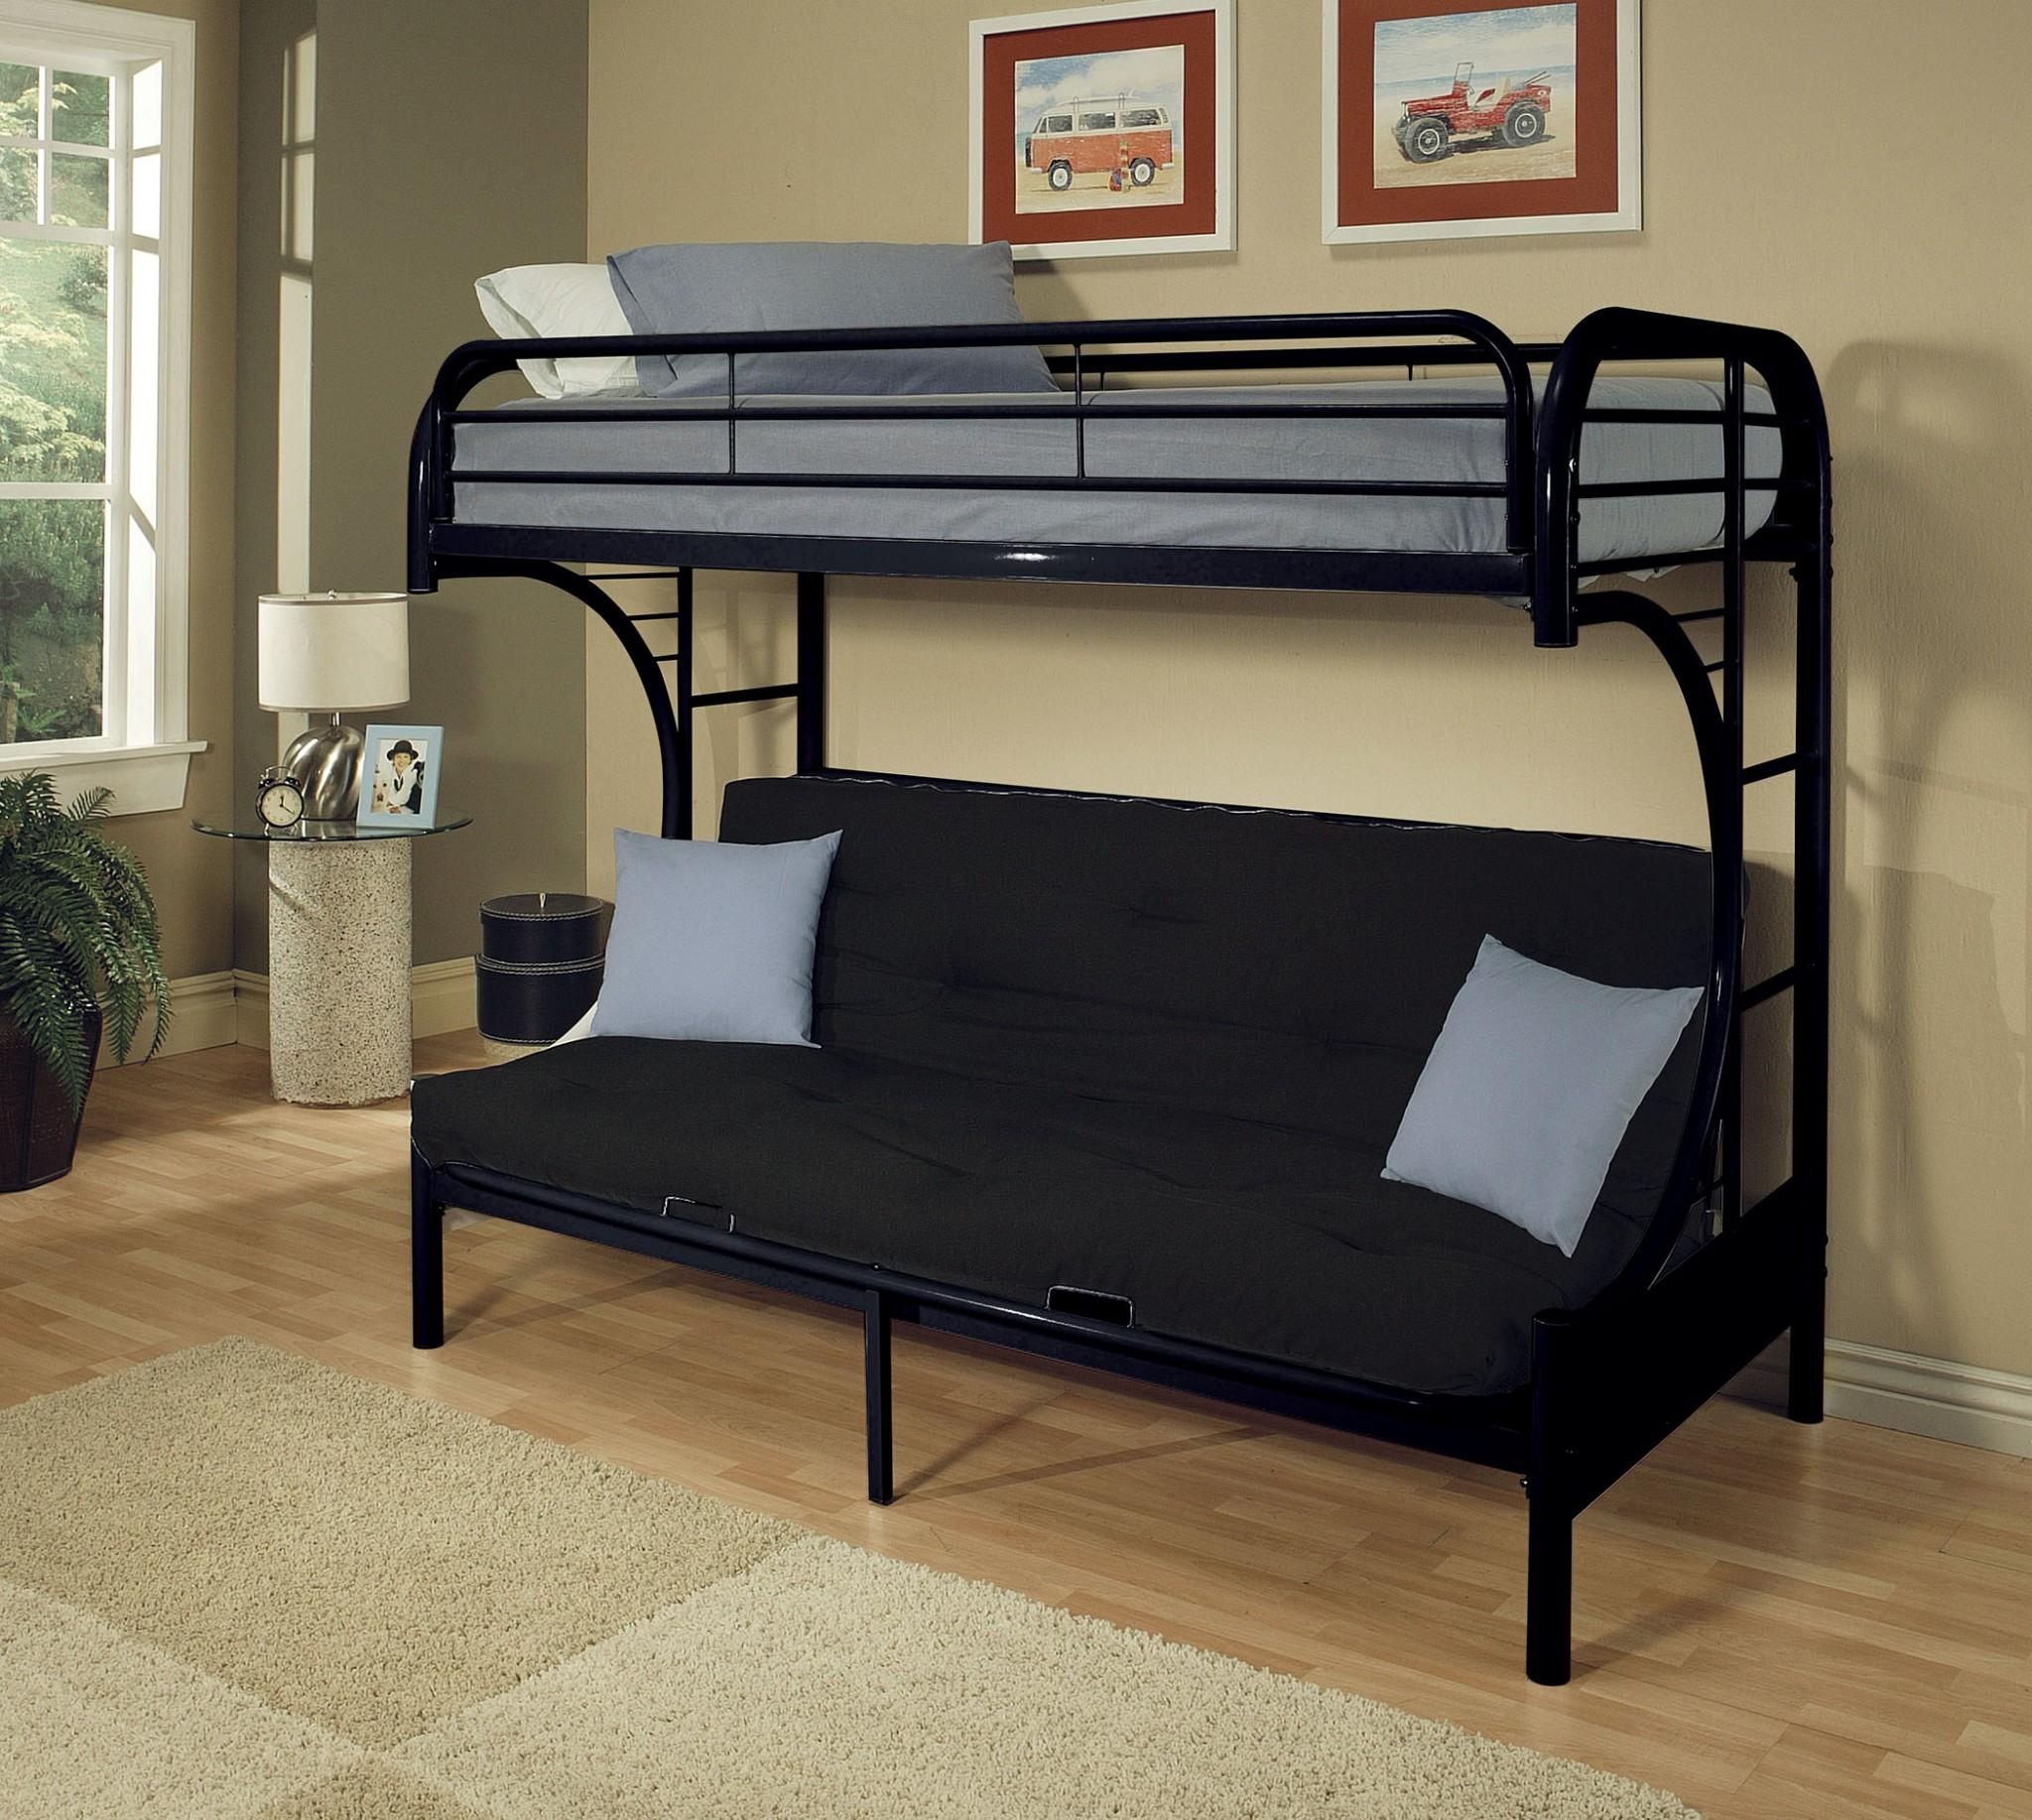 Twin Xl/Queen/Futon Bunk Bed, Black - Metal Tube Black